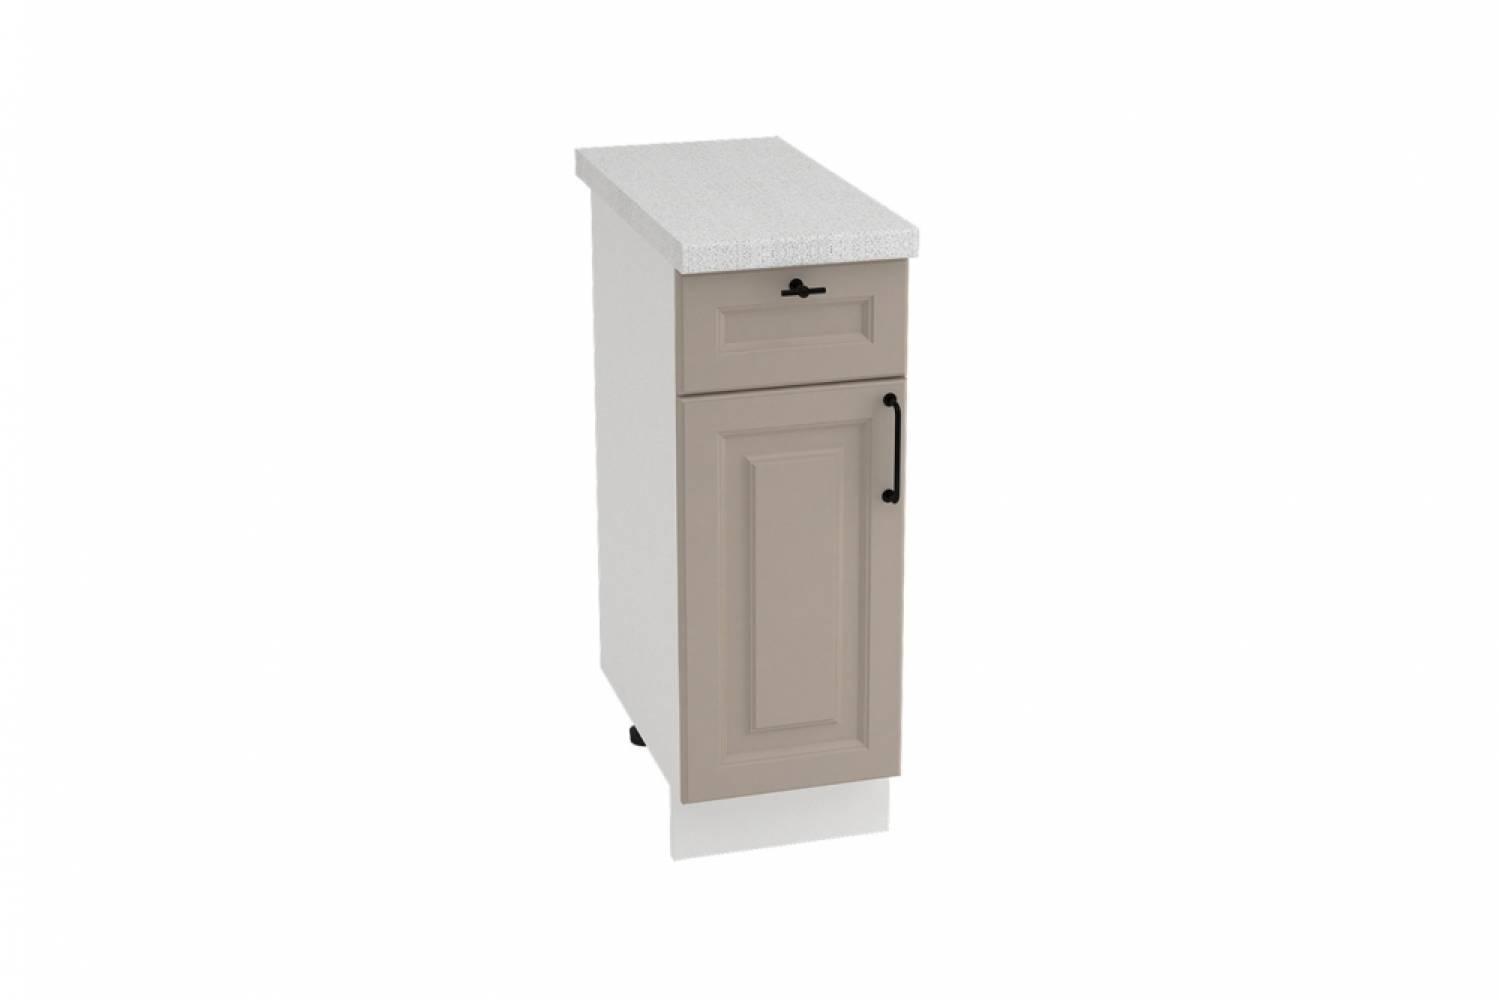 Шкаф нижний с 1 ящиком ШН1Я 300 НИЦЦА ROYAL (OMNIA) 300 мм